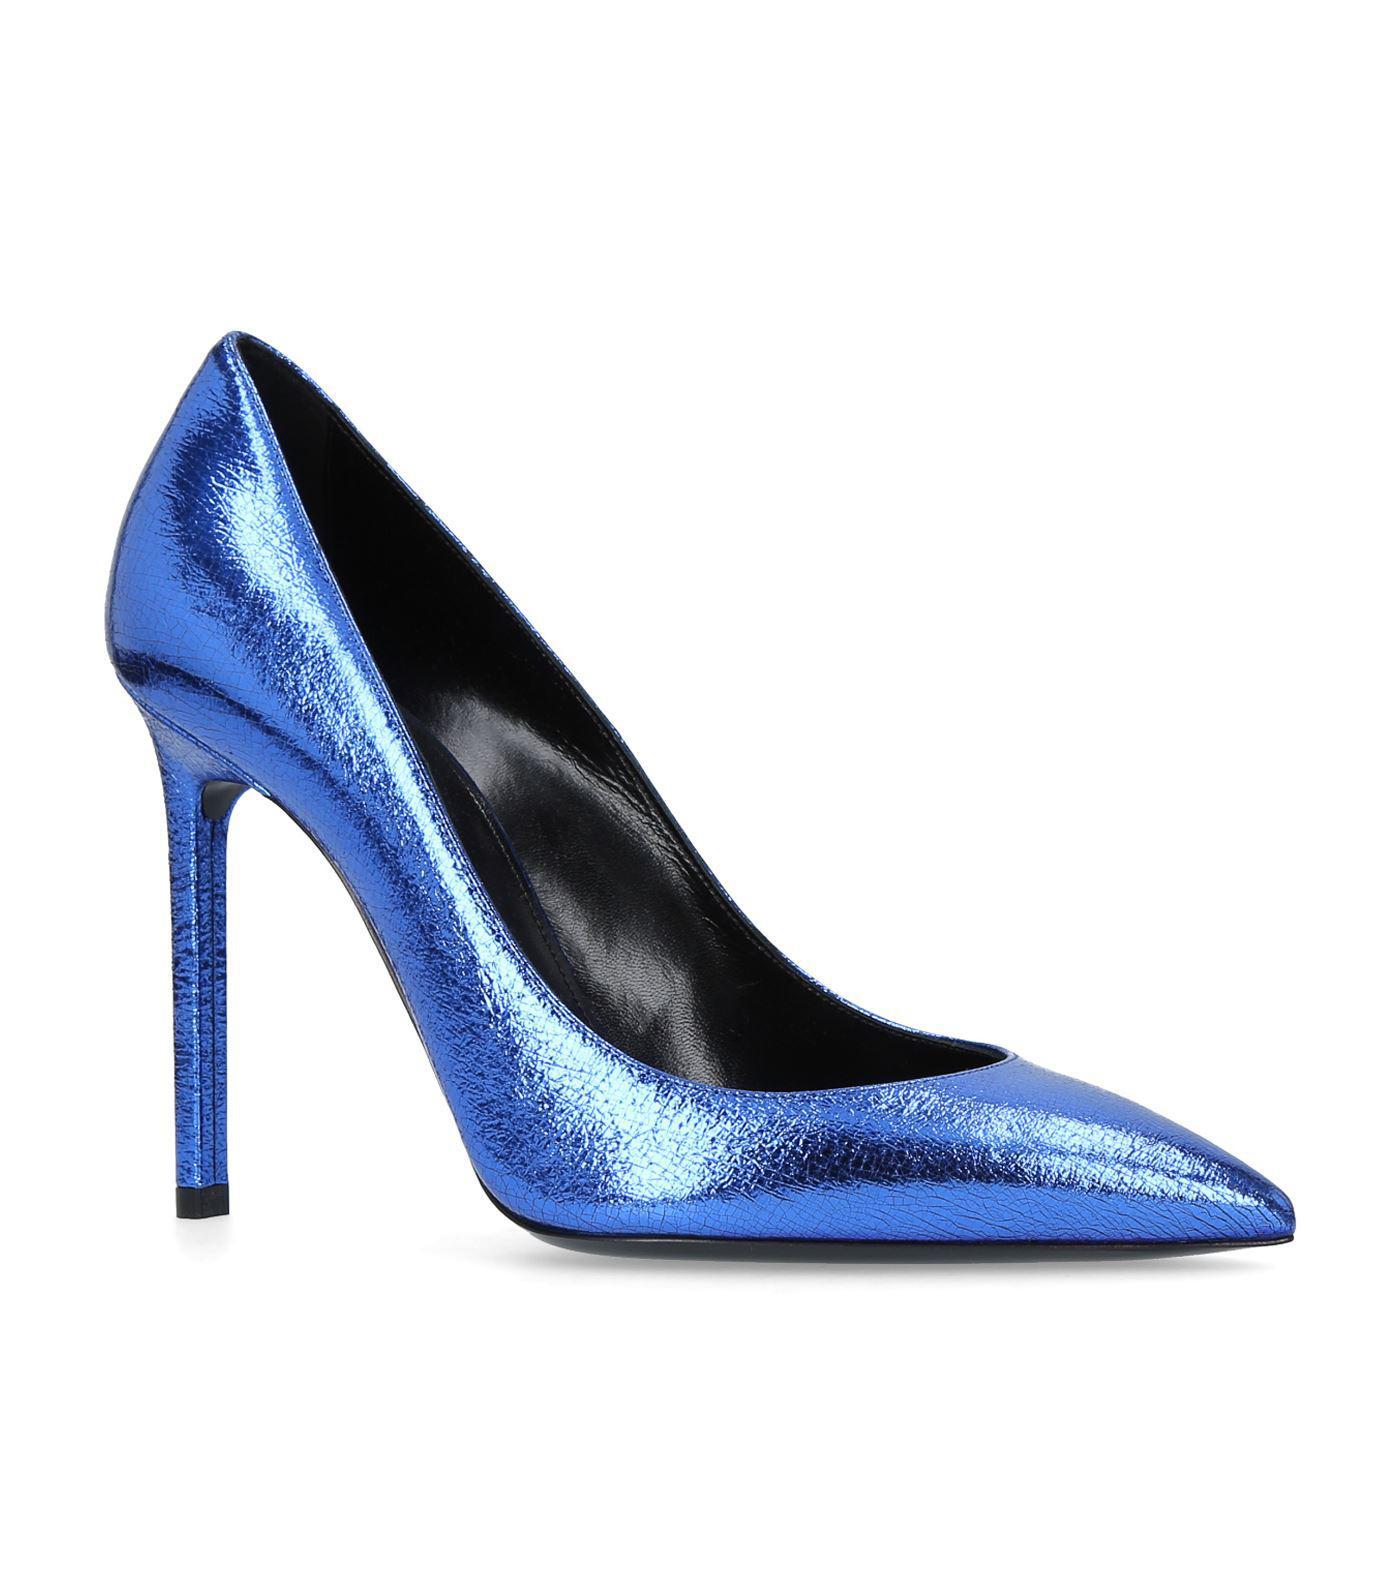 Saint Laurent Anja 105 Pompes - Bleu jI2xfHASQ